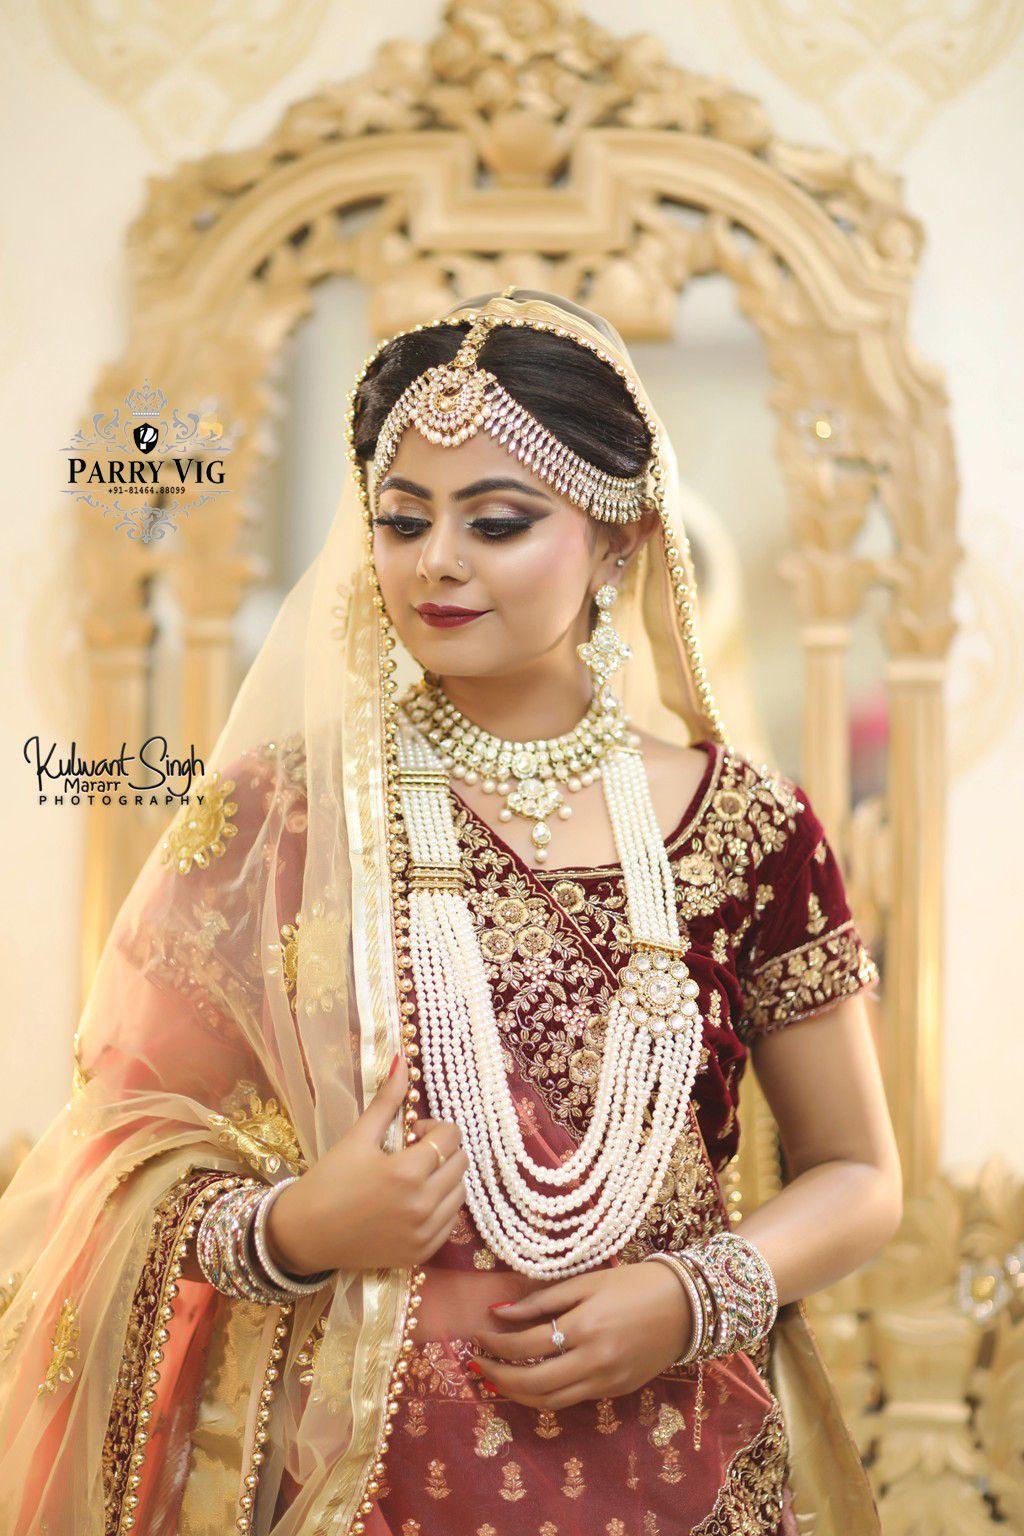 Best Makeup Artist In Ludhiana Punjab Parry Vig Is Top And Best Makeup Artist In Ludhiana City Of Best Makeup Artist Best Makeup Products Bridal Makeup Artist